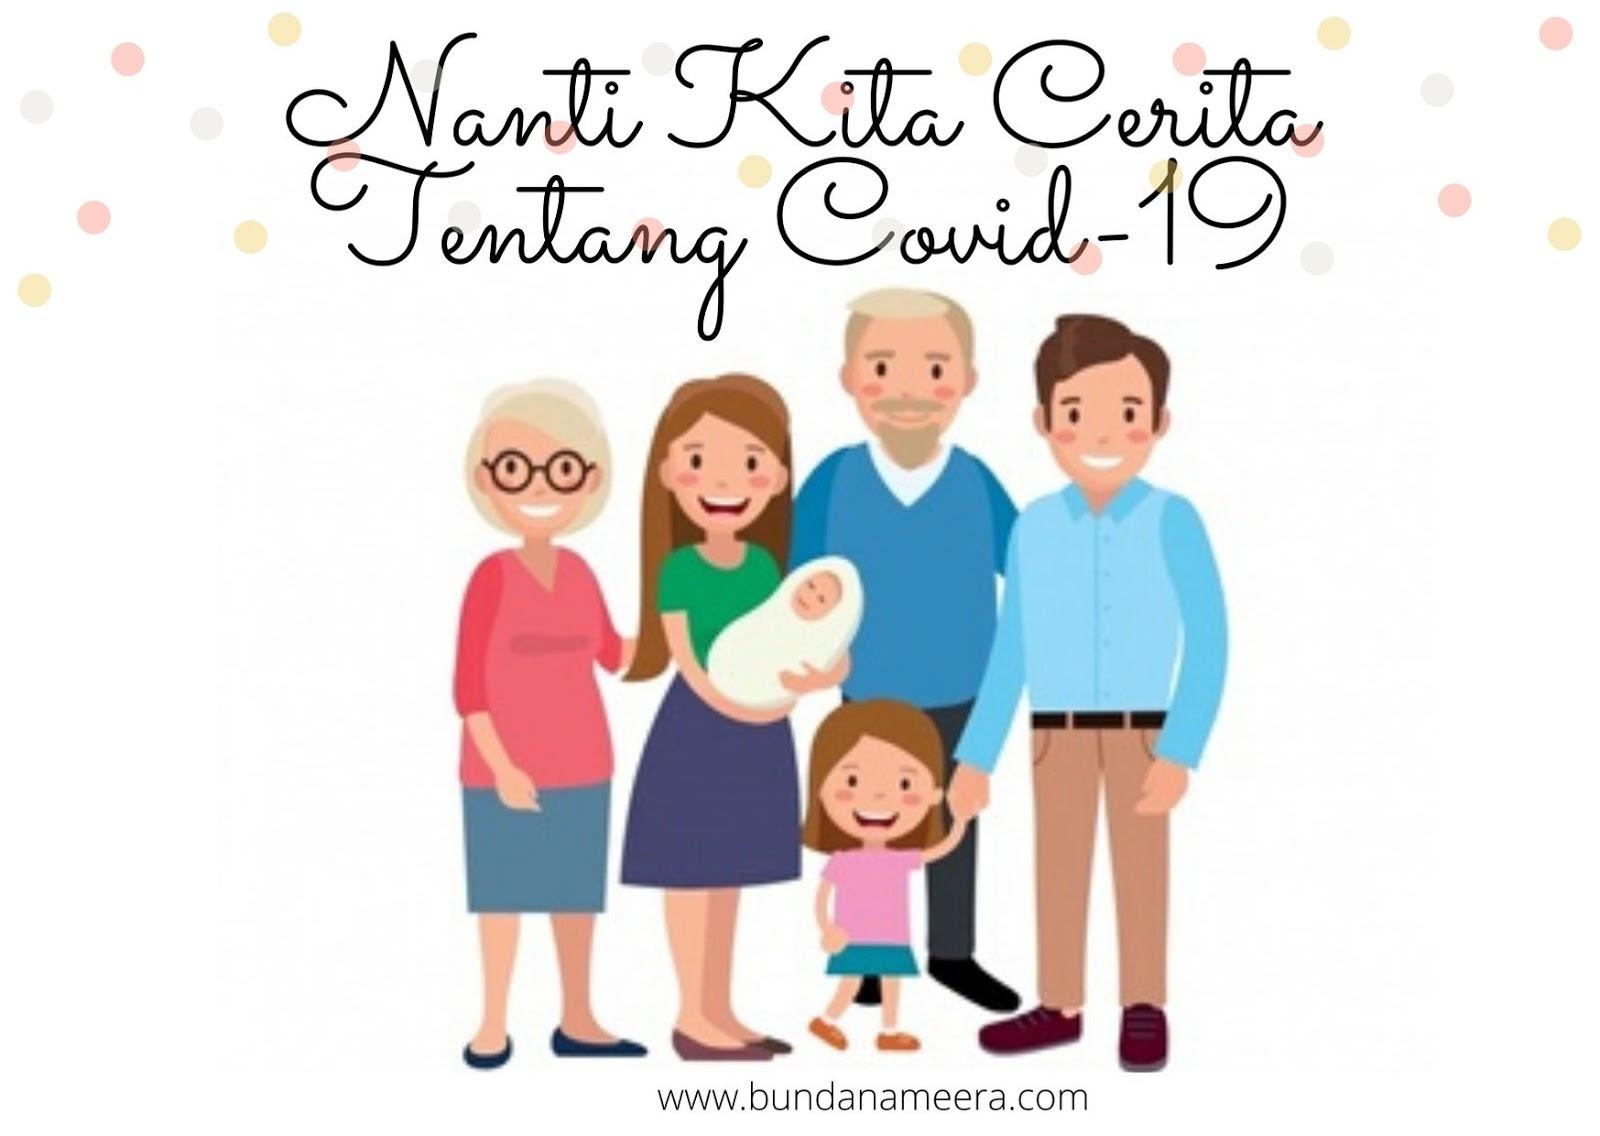 Covid-19 di Indonesia terjadi sejak bulan maret dimana diawali dengan 2 positif yang ada di Depok, edukasi kepada anak tentang covid-19, pengertian covid-19